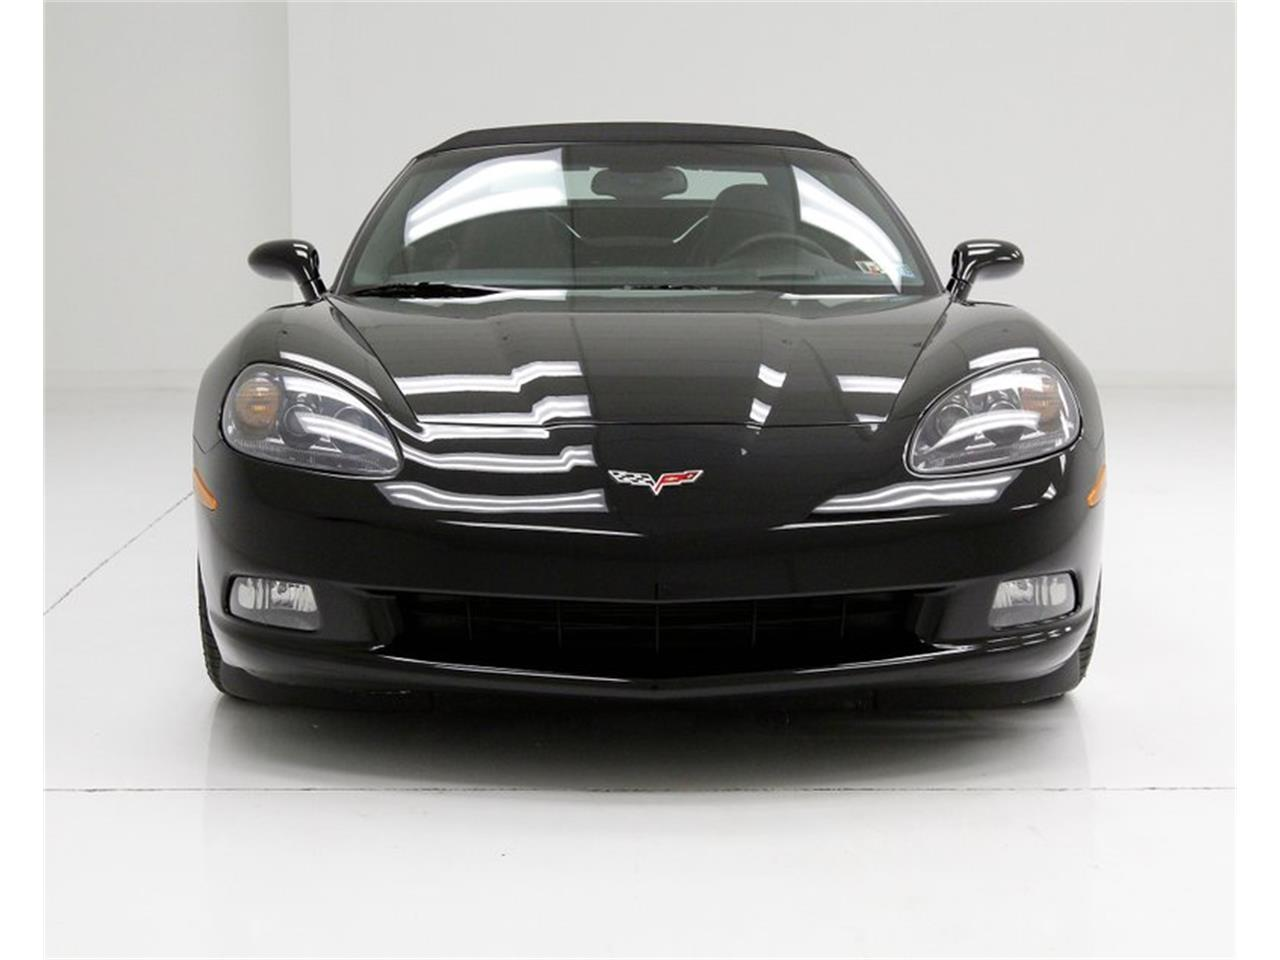 Large Picture of 2007 Corvette located in Pennsylvania - $29,900.00 - P3IA